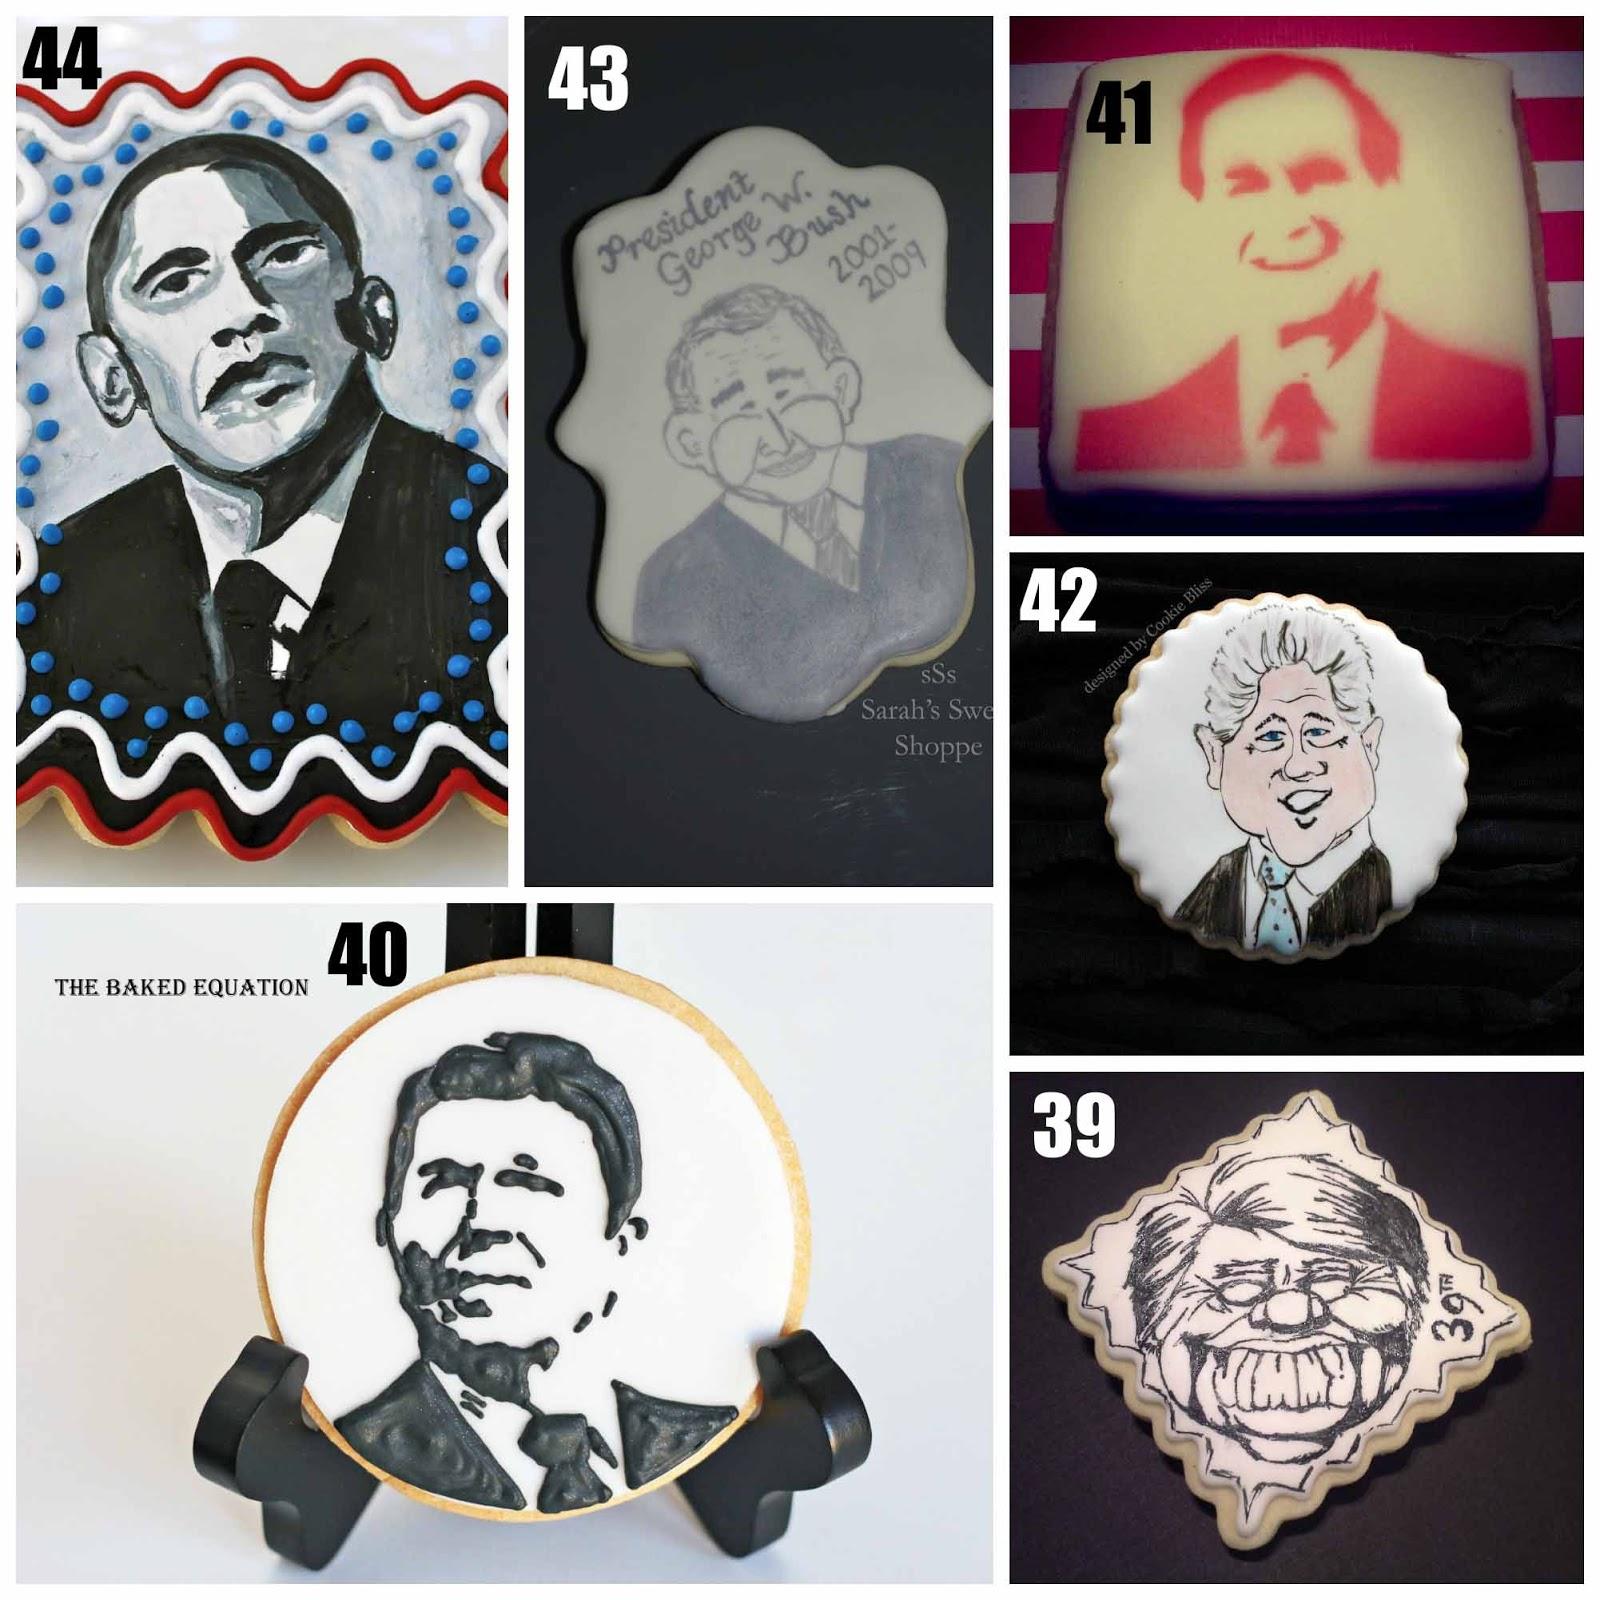 http://1.bp.blogspot.com/-2Yssq4WmZRg/USJrIPN4UXI/AAAAAAAAAWs/hl21hWKLsFo/s1600/presidents+39-44+collage+FINAL.jpg